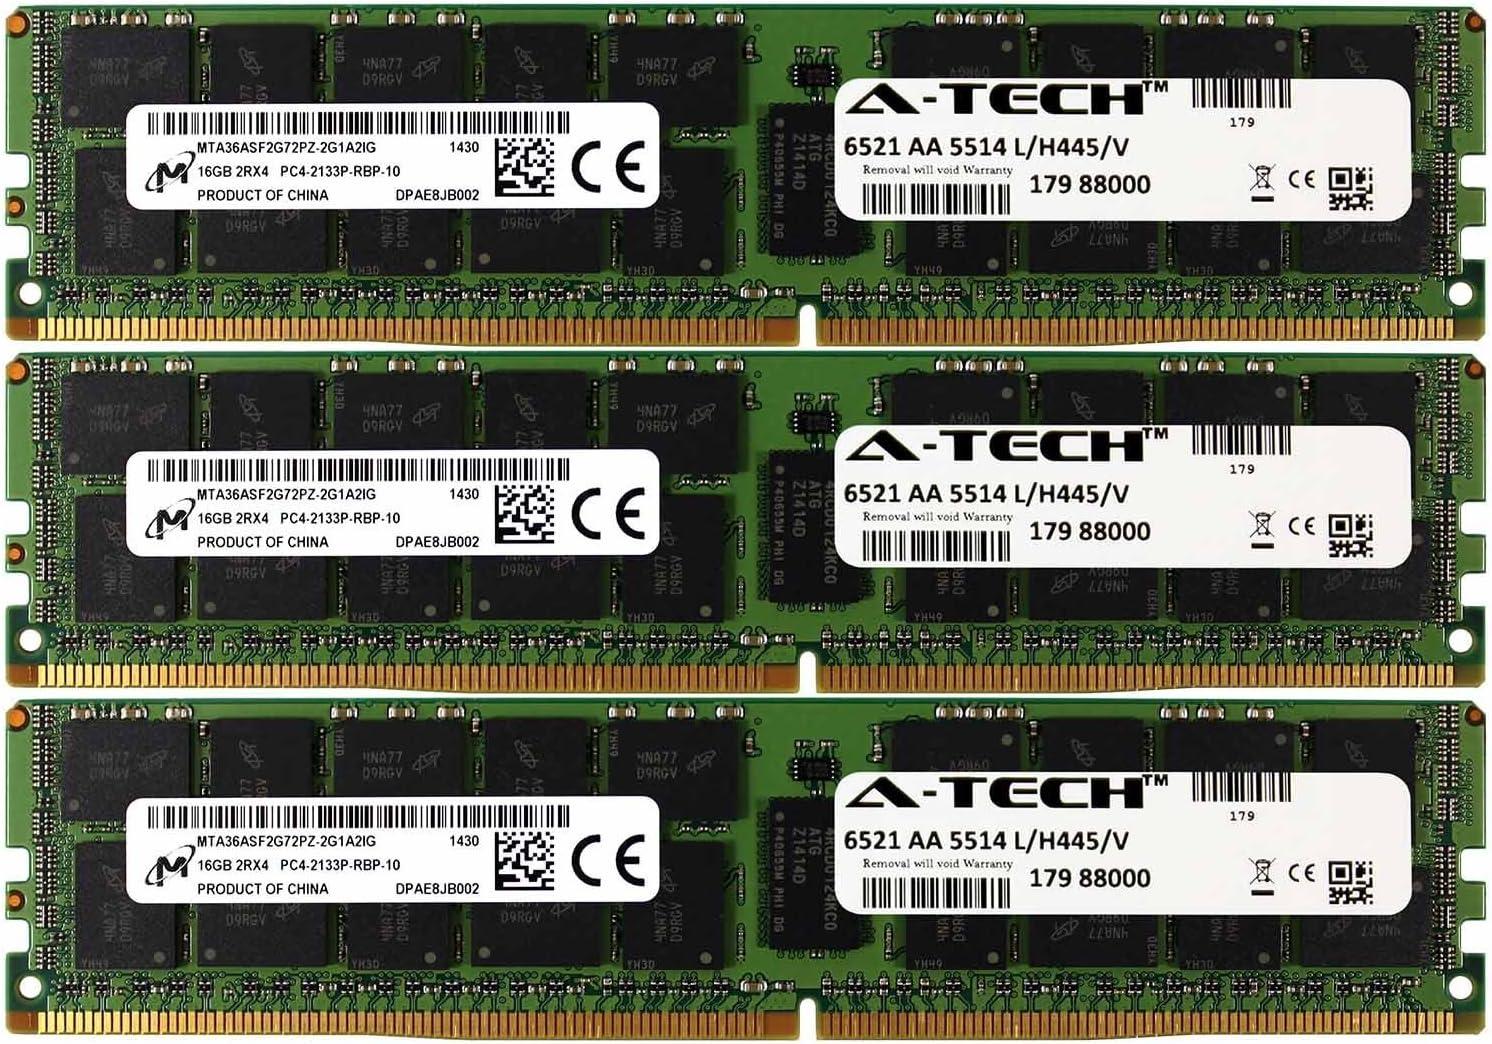 PC4-17000 Samsung 16GB Module HP Cloudline CL2100 CL2200 G3 1211R Memory RAM